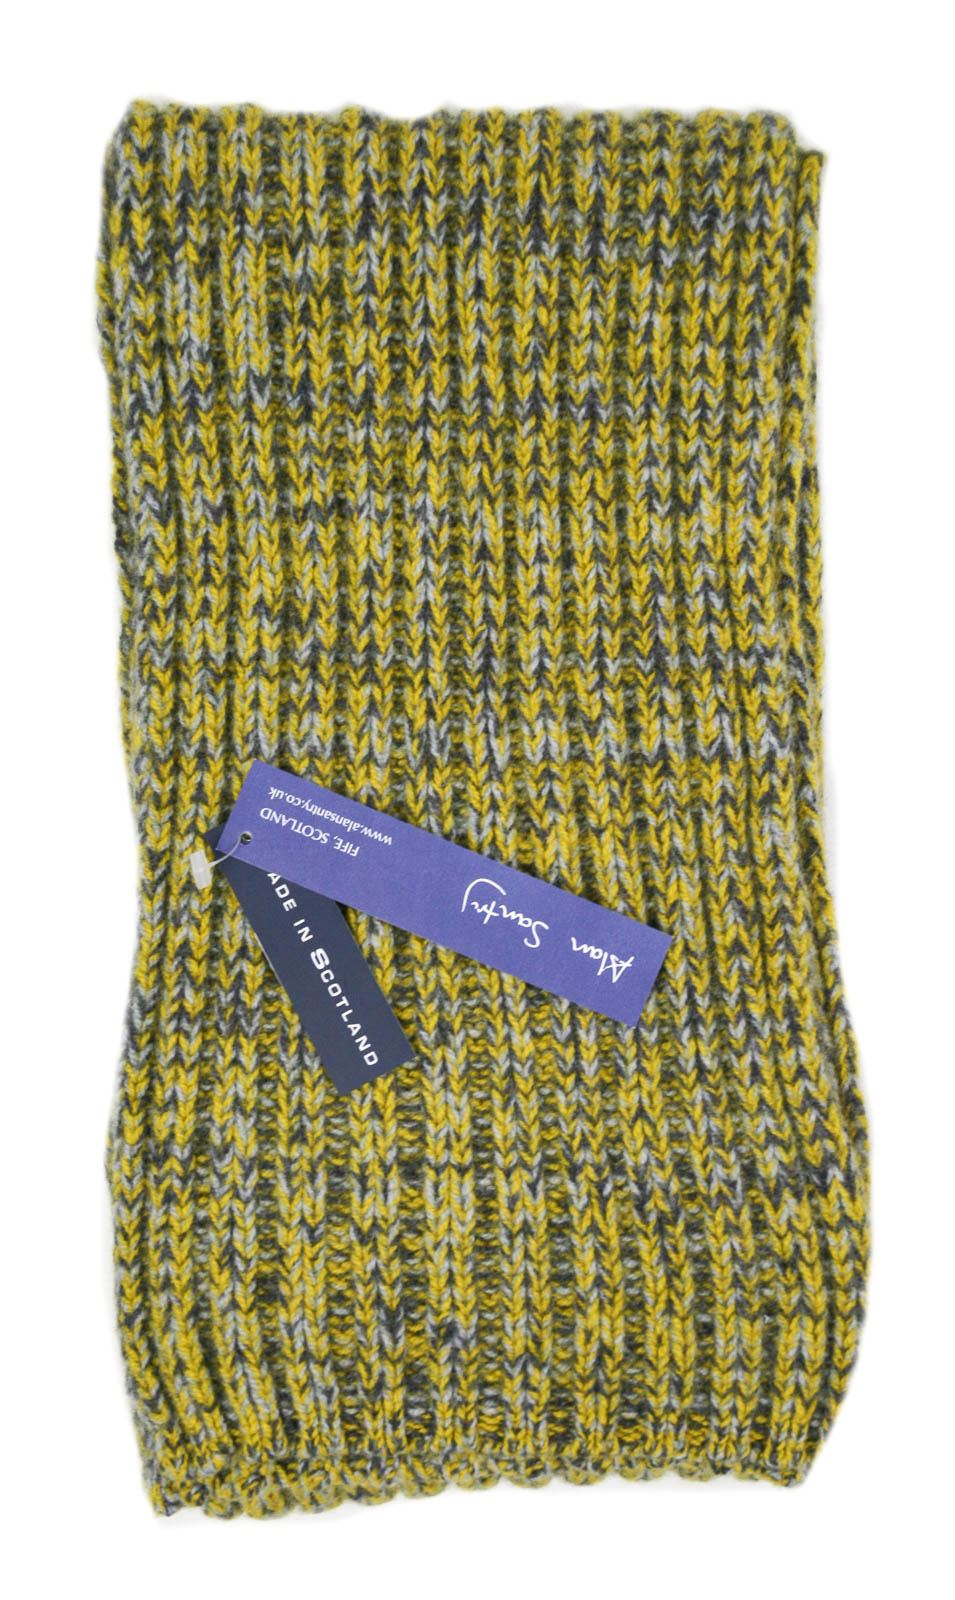 Laine d/'Agneau Tricot Long Écharpe-Canna-Jaune ou bleu-made in Scotland